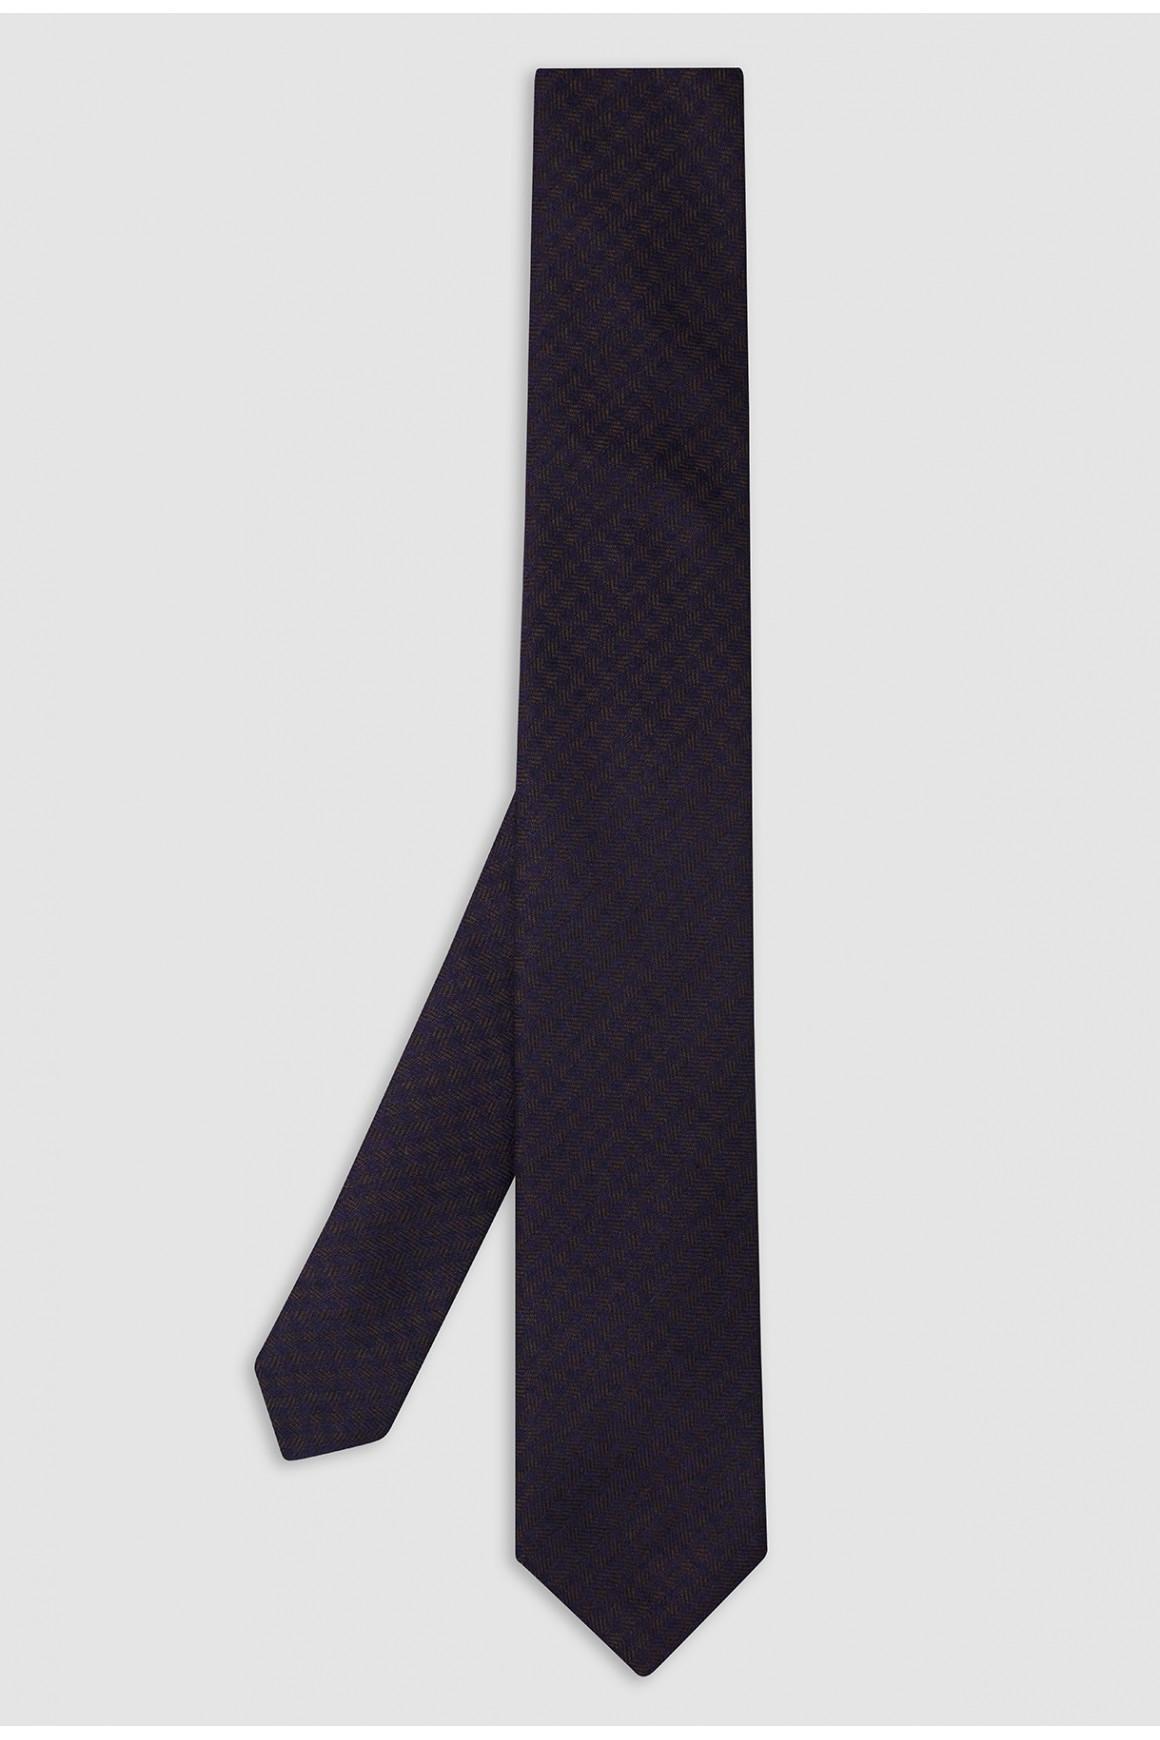 Cravate Marron Soie Et...